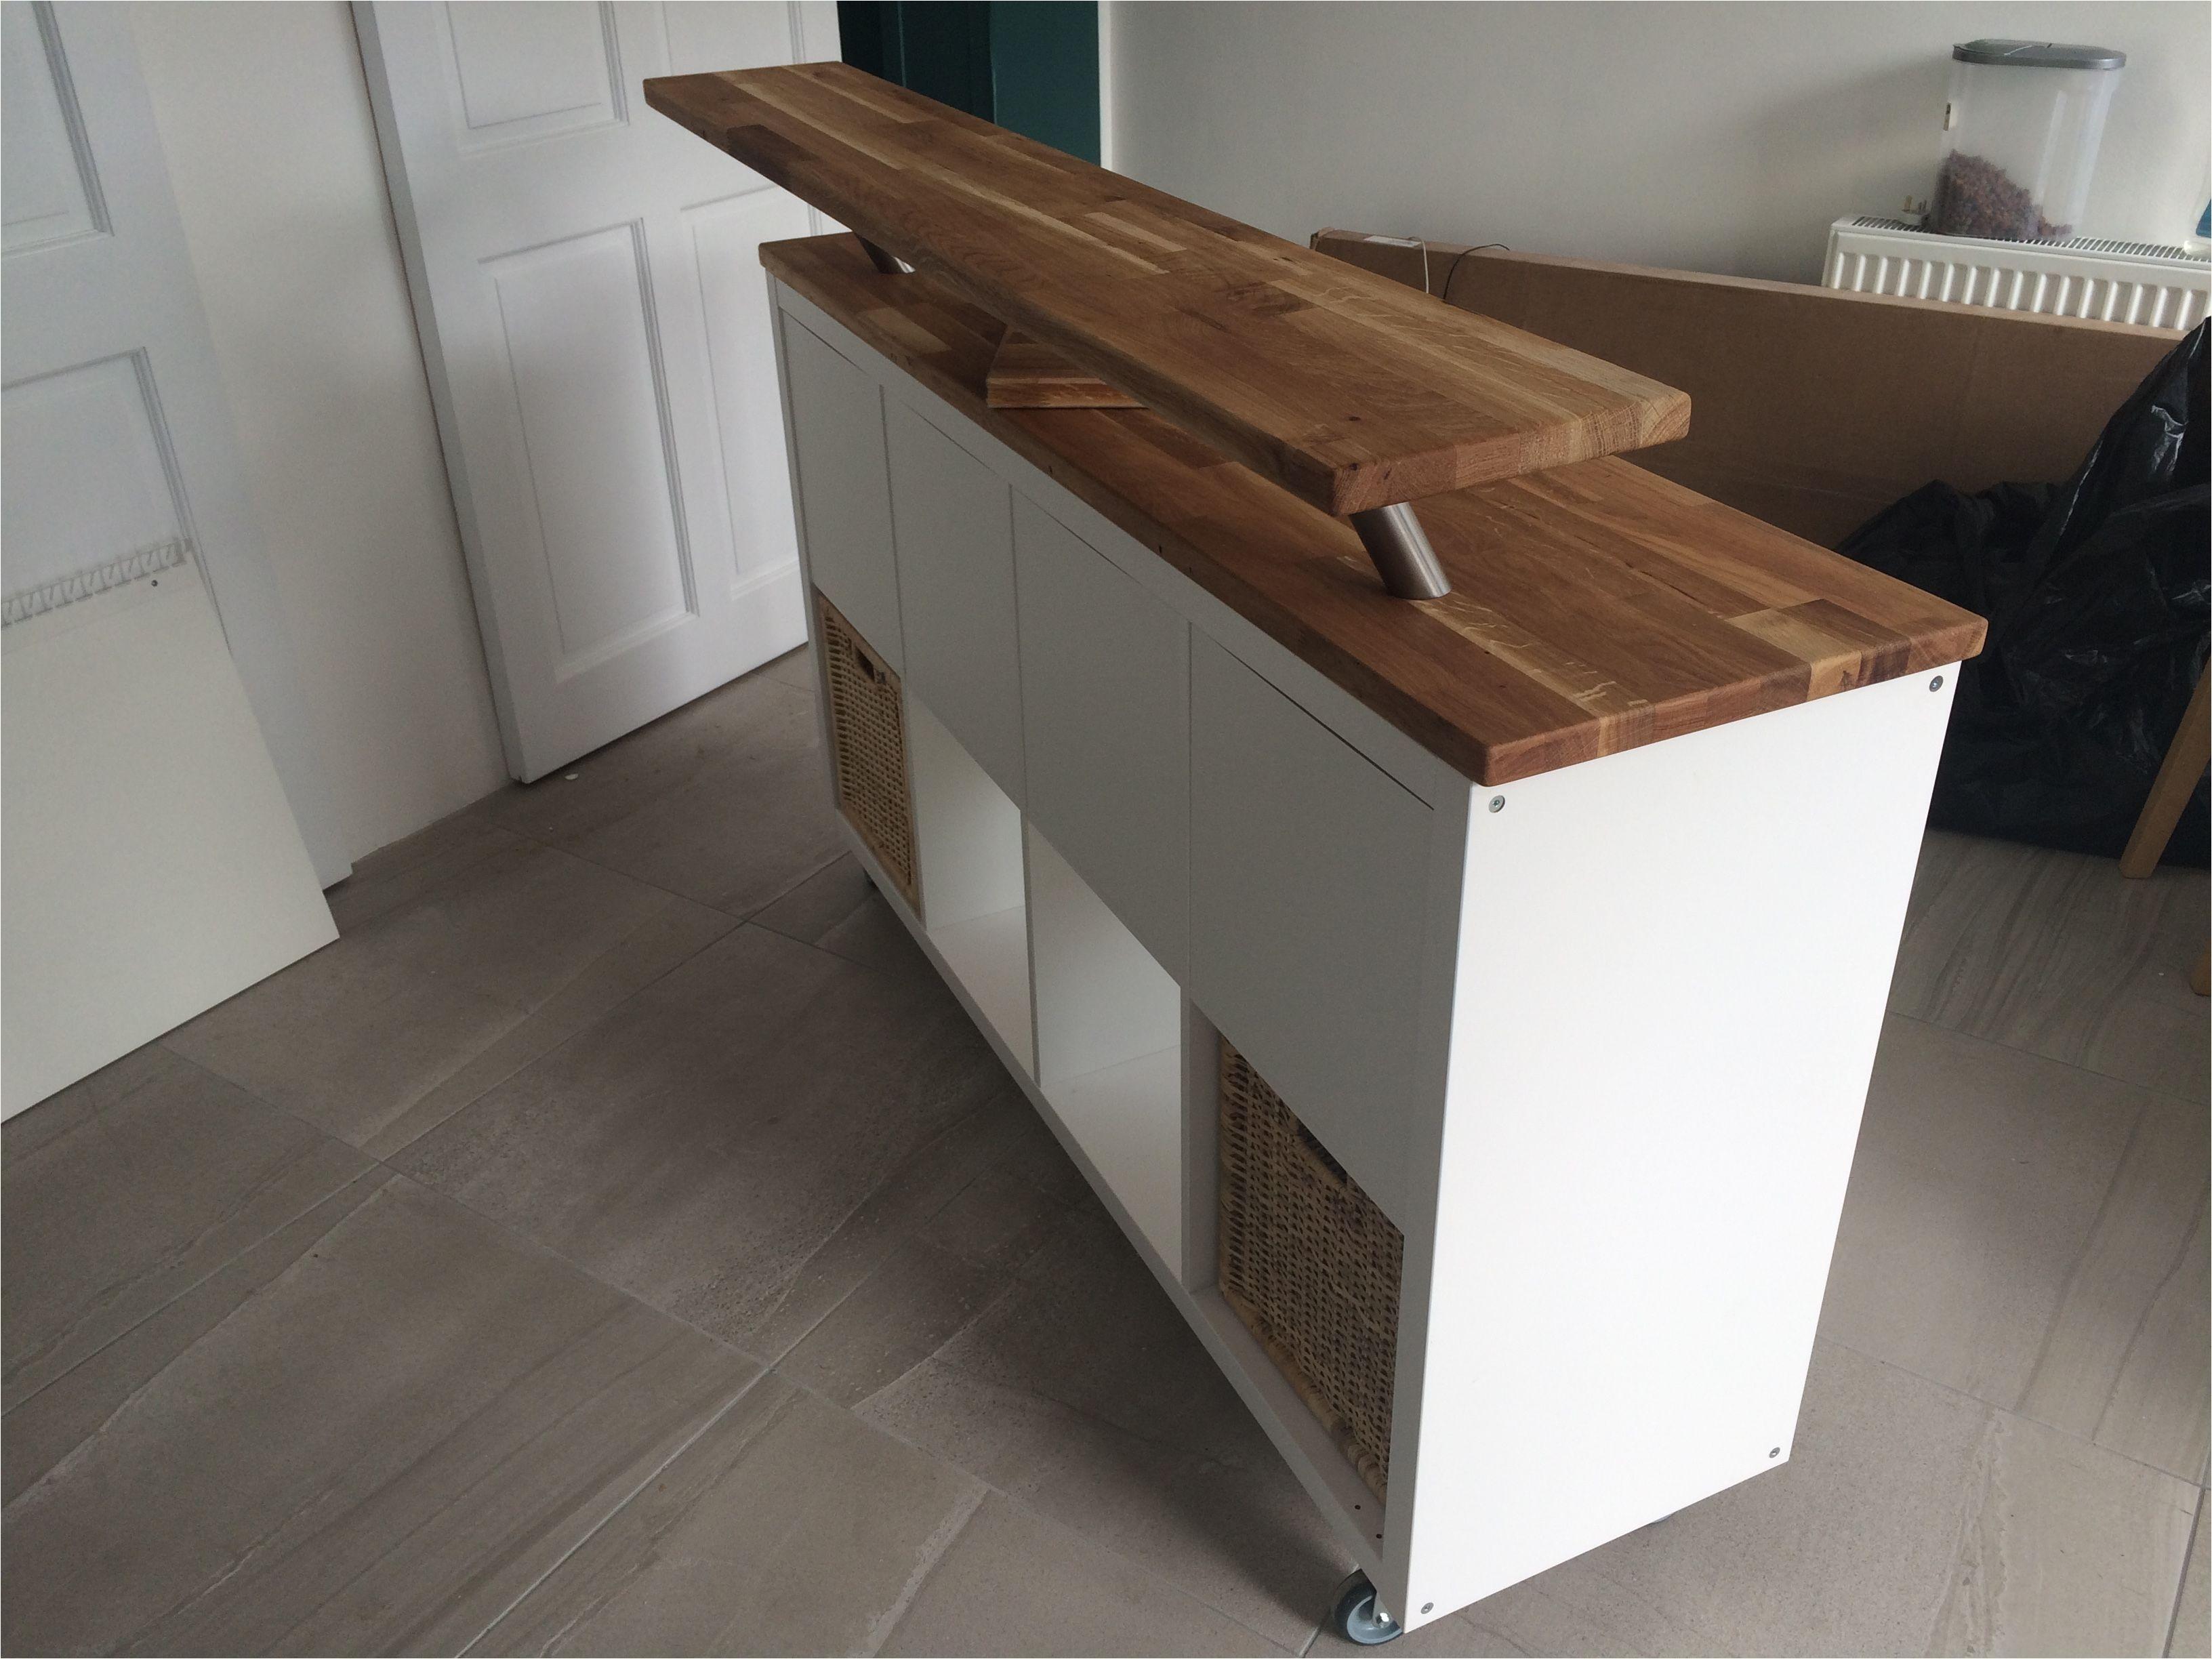 ikea hack kitchen island breakfast bar kallax on heavy duty casters with offcuts of hammar solid wood counter top